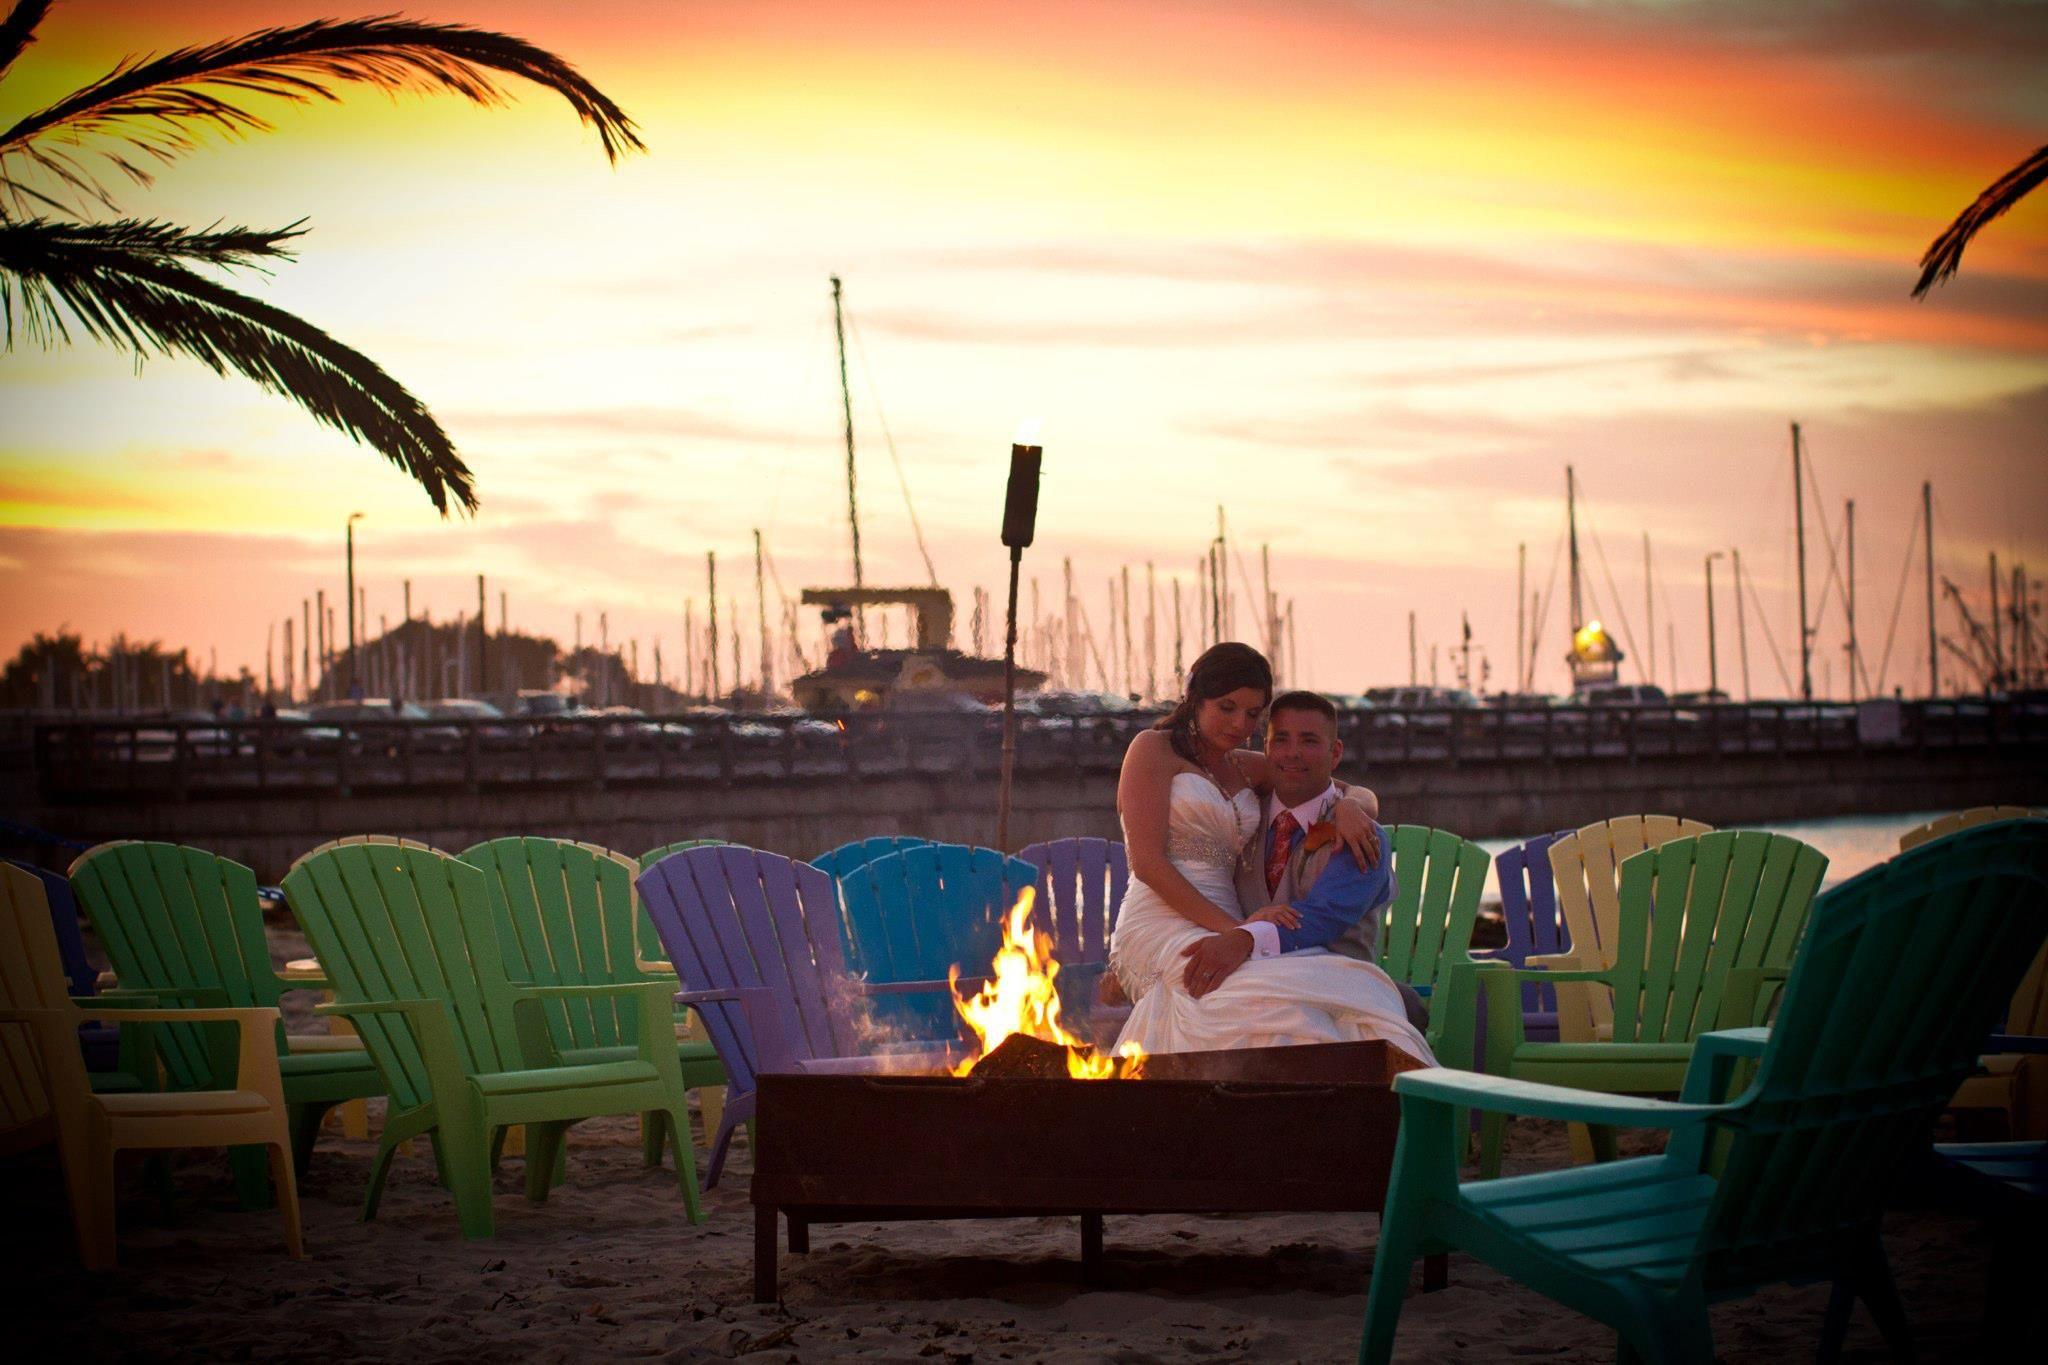 Sunrise beach wedding  BrideGroom enjoying a romantic beach bonfire after their wedding